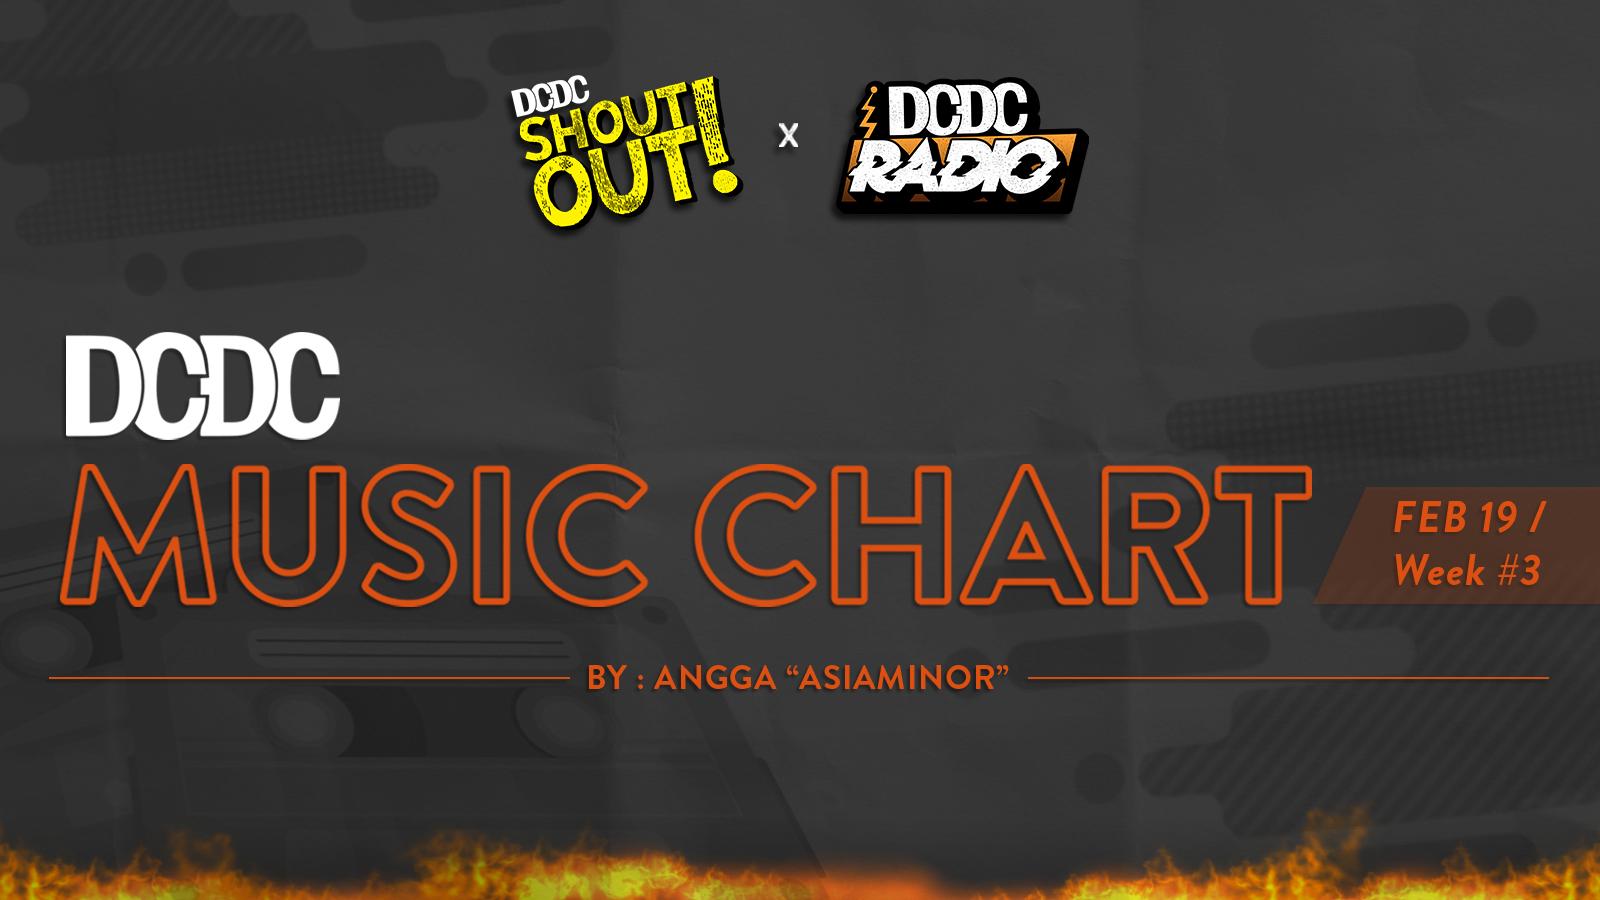 DCDC Music Chart - #3rd Week of February 2019